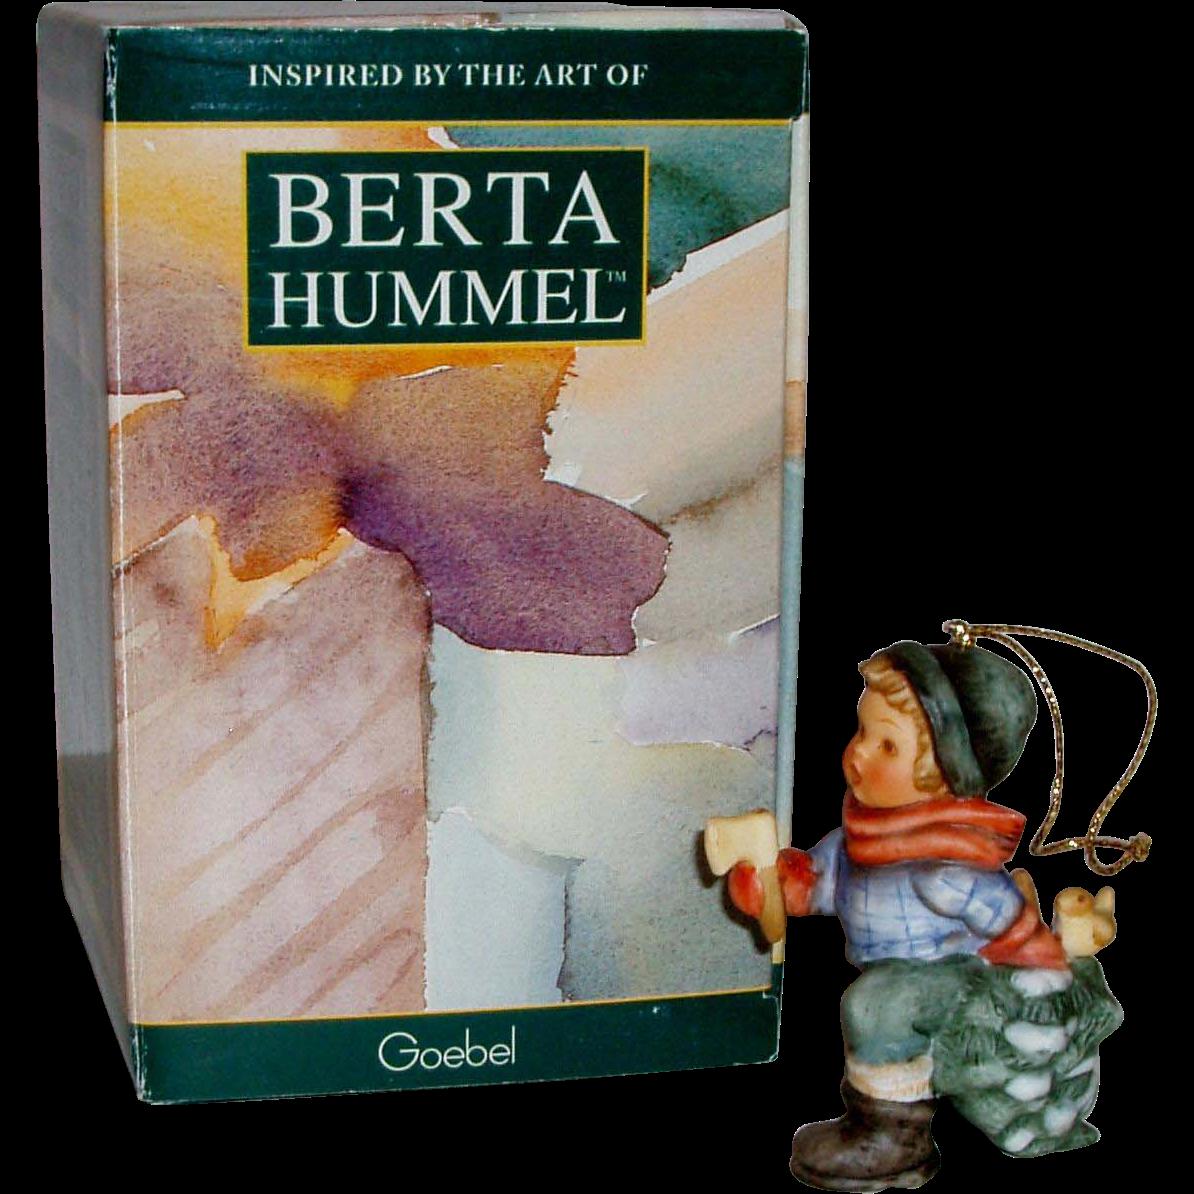 Hummel christmas tree ornaments - A Berta Hummel Christmas Fresh Christmas Tree Ornament Bh47 Original Box